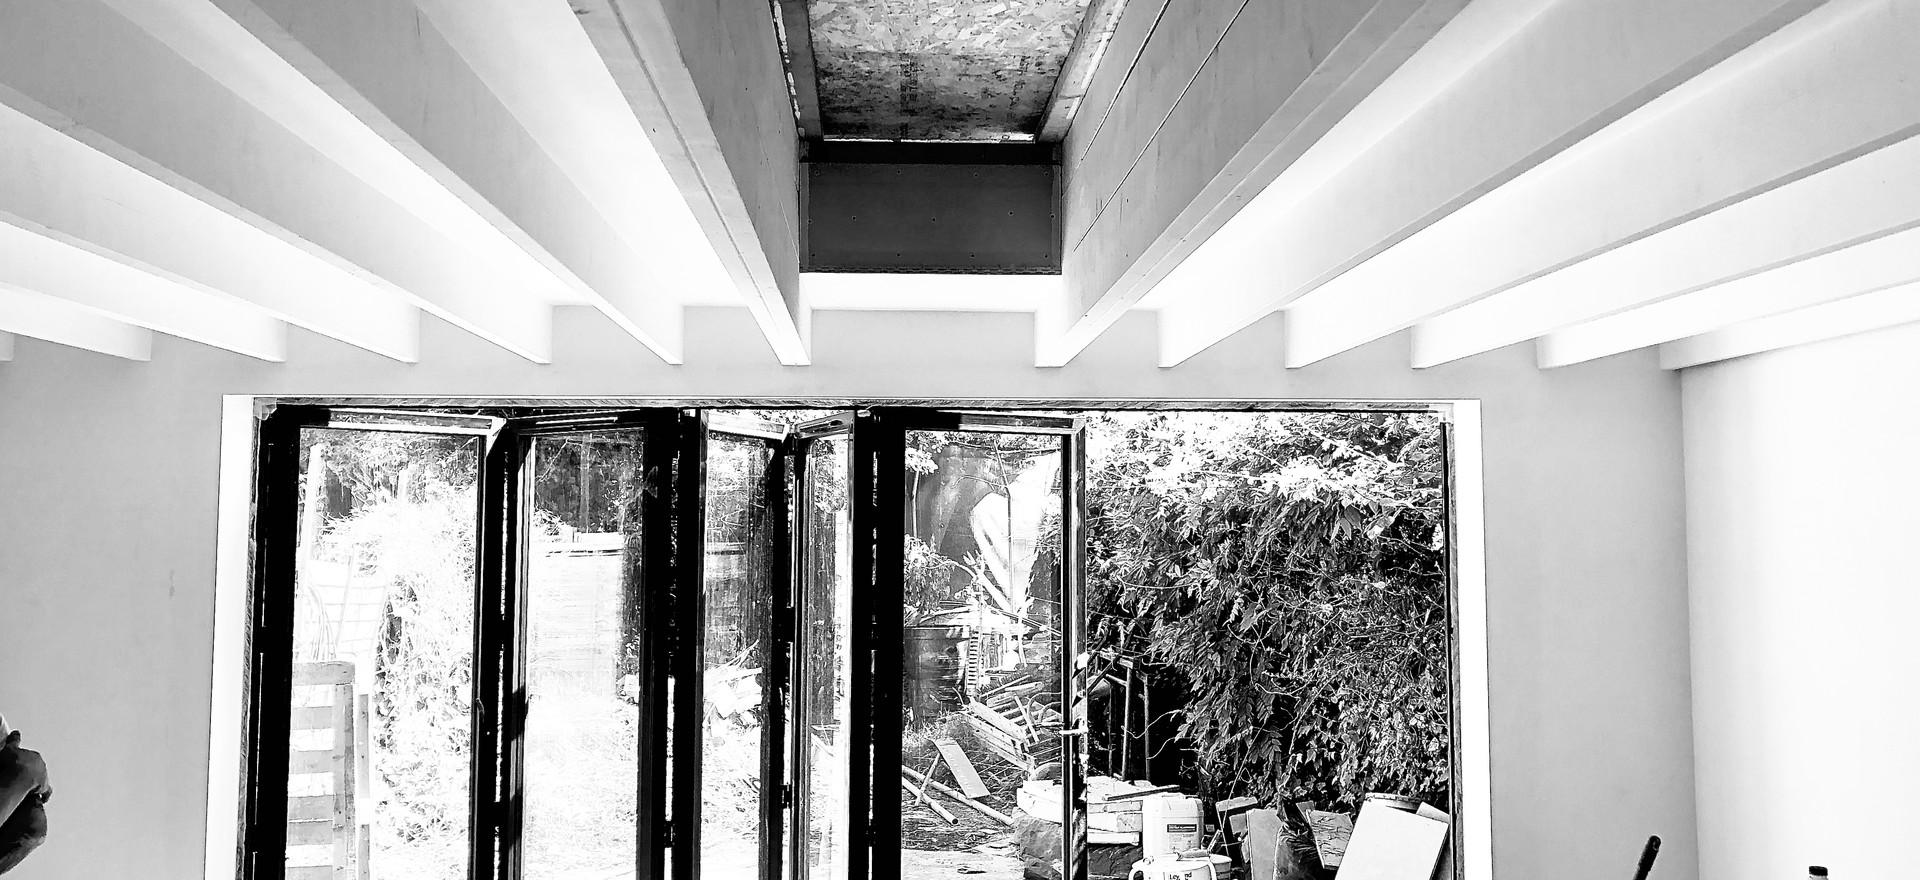 wr-ap_31 MR_site photo 05.JPG